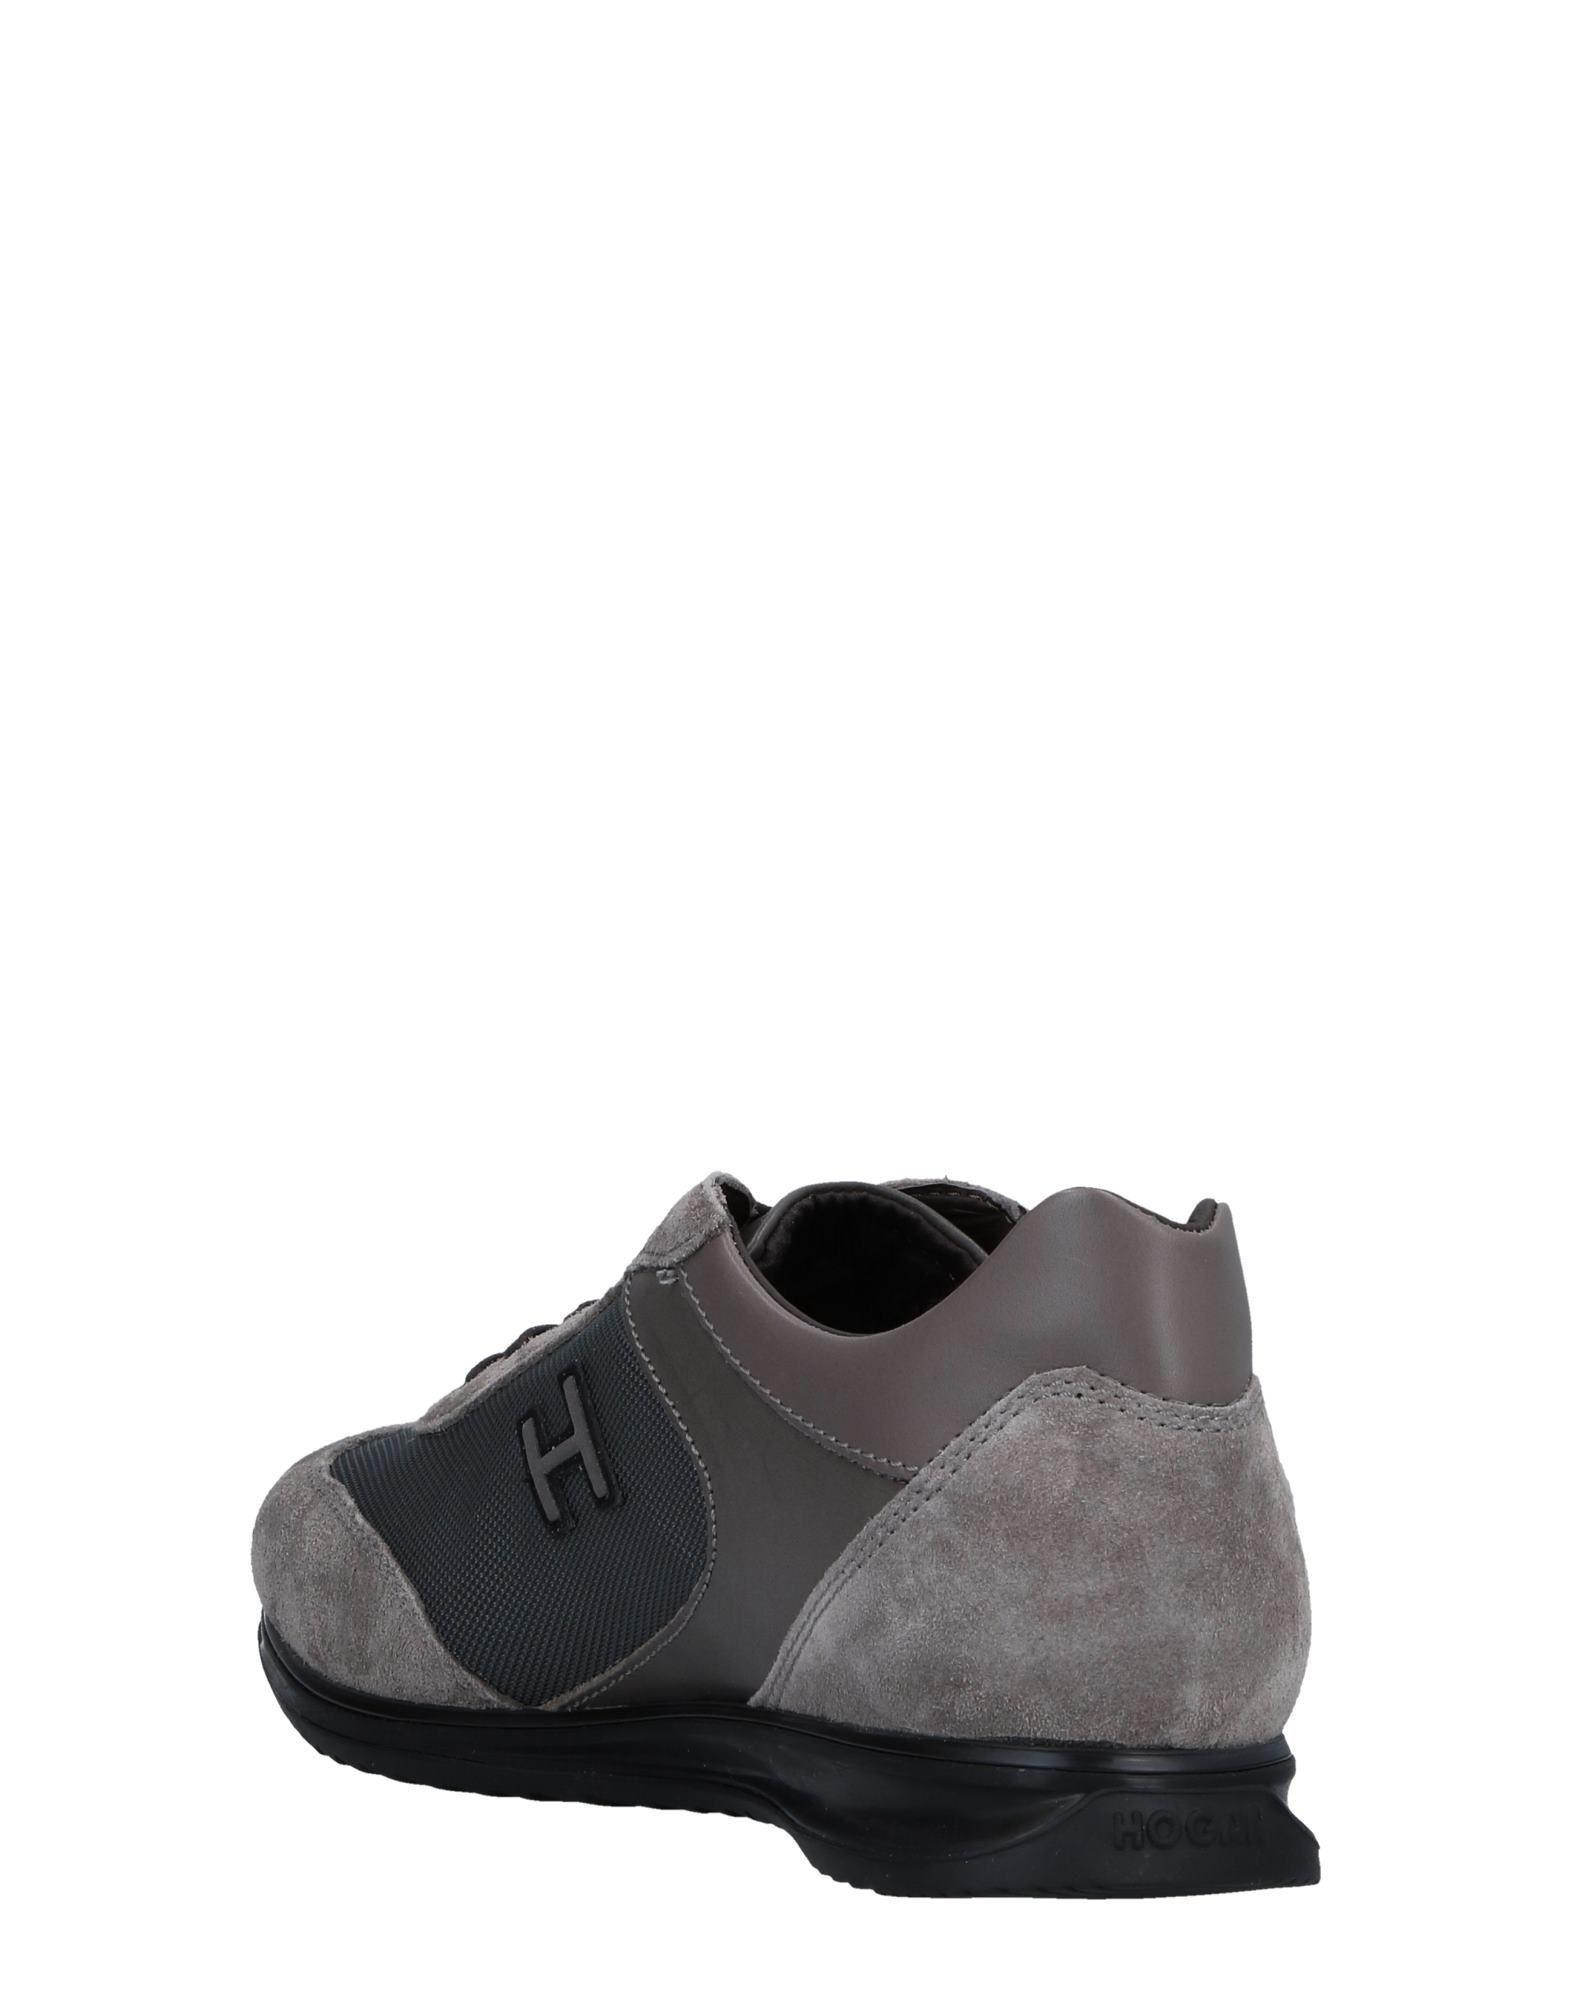 Hogan Light Grey Leather Sneakers